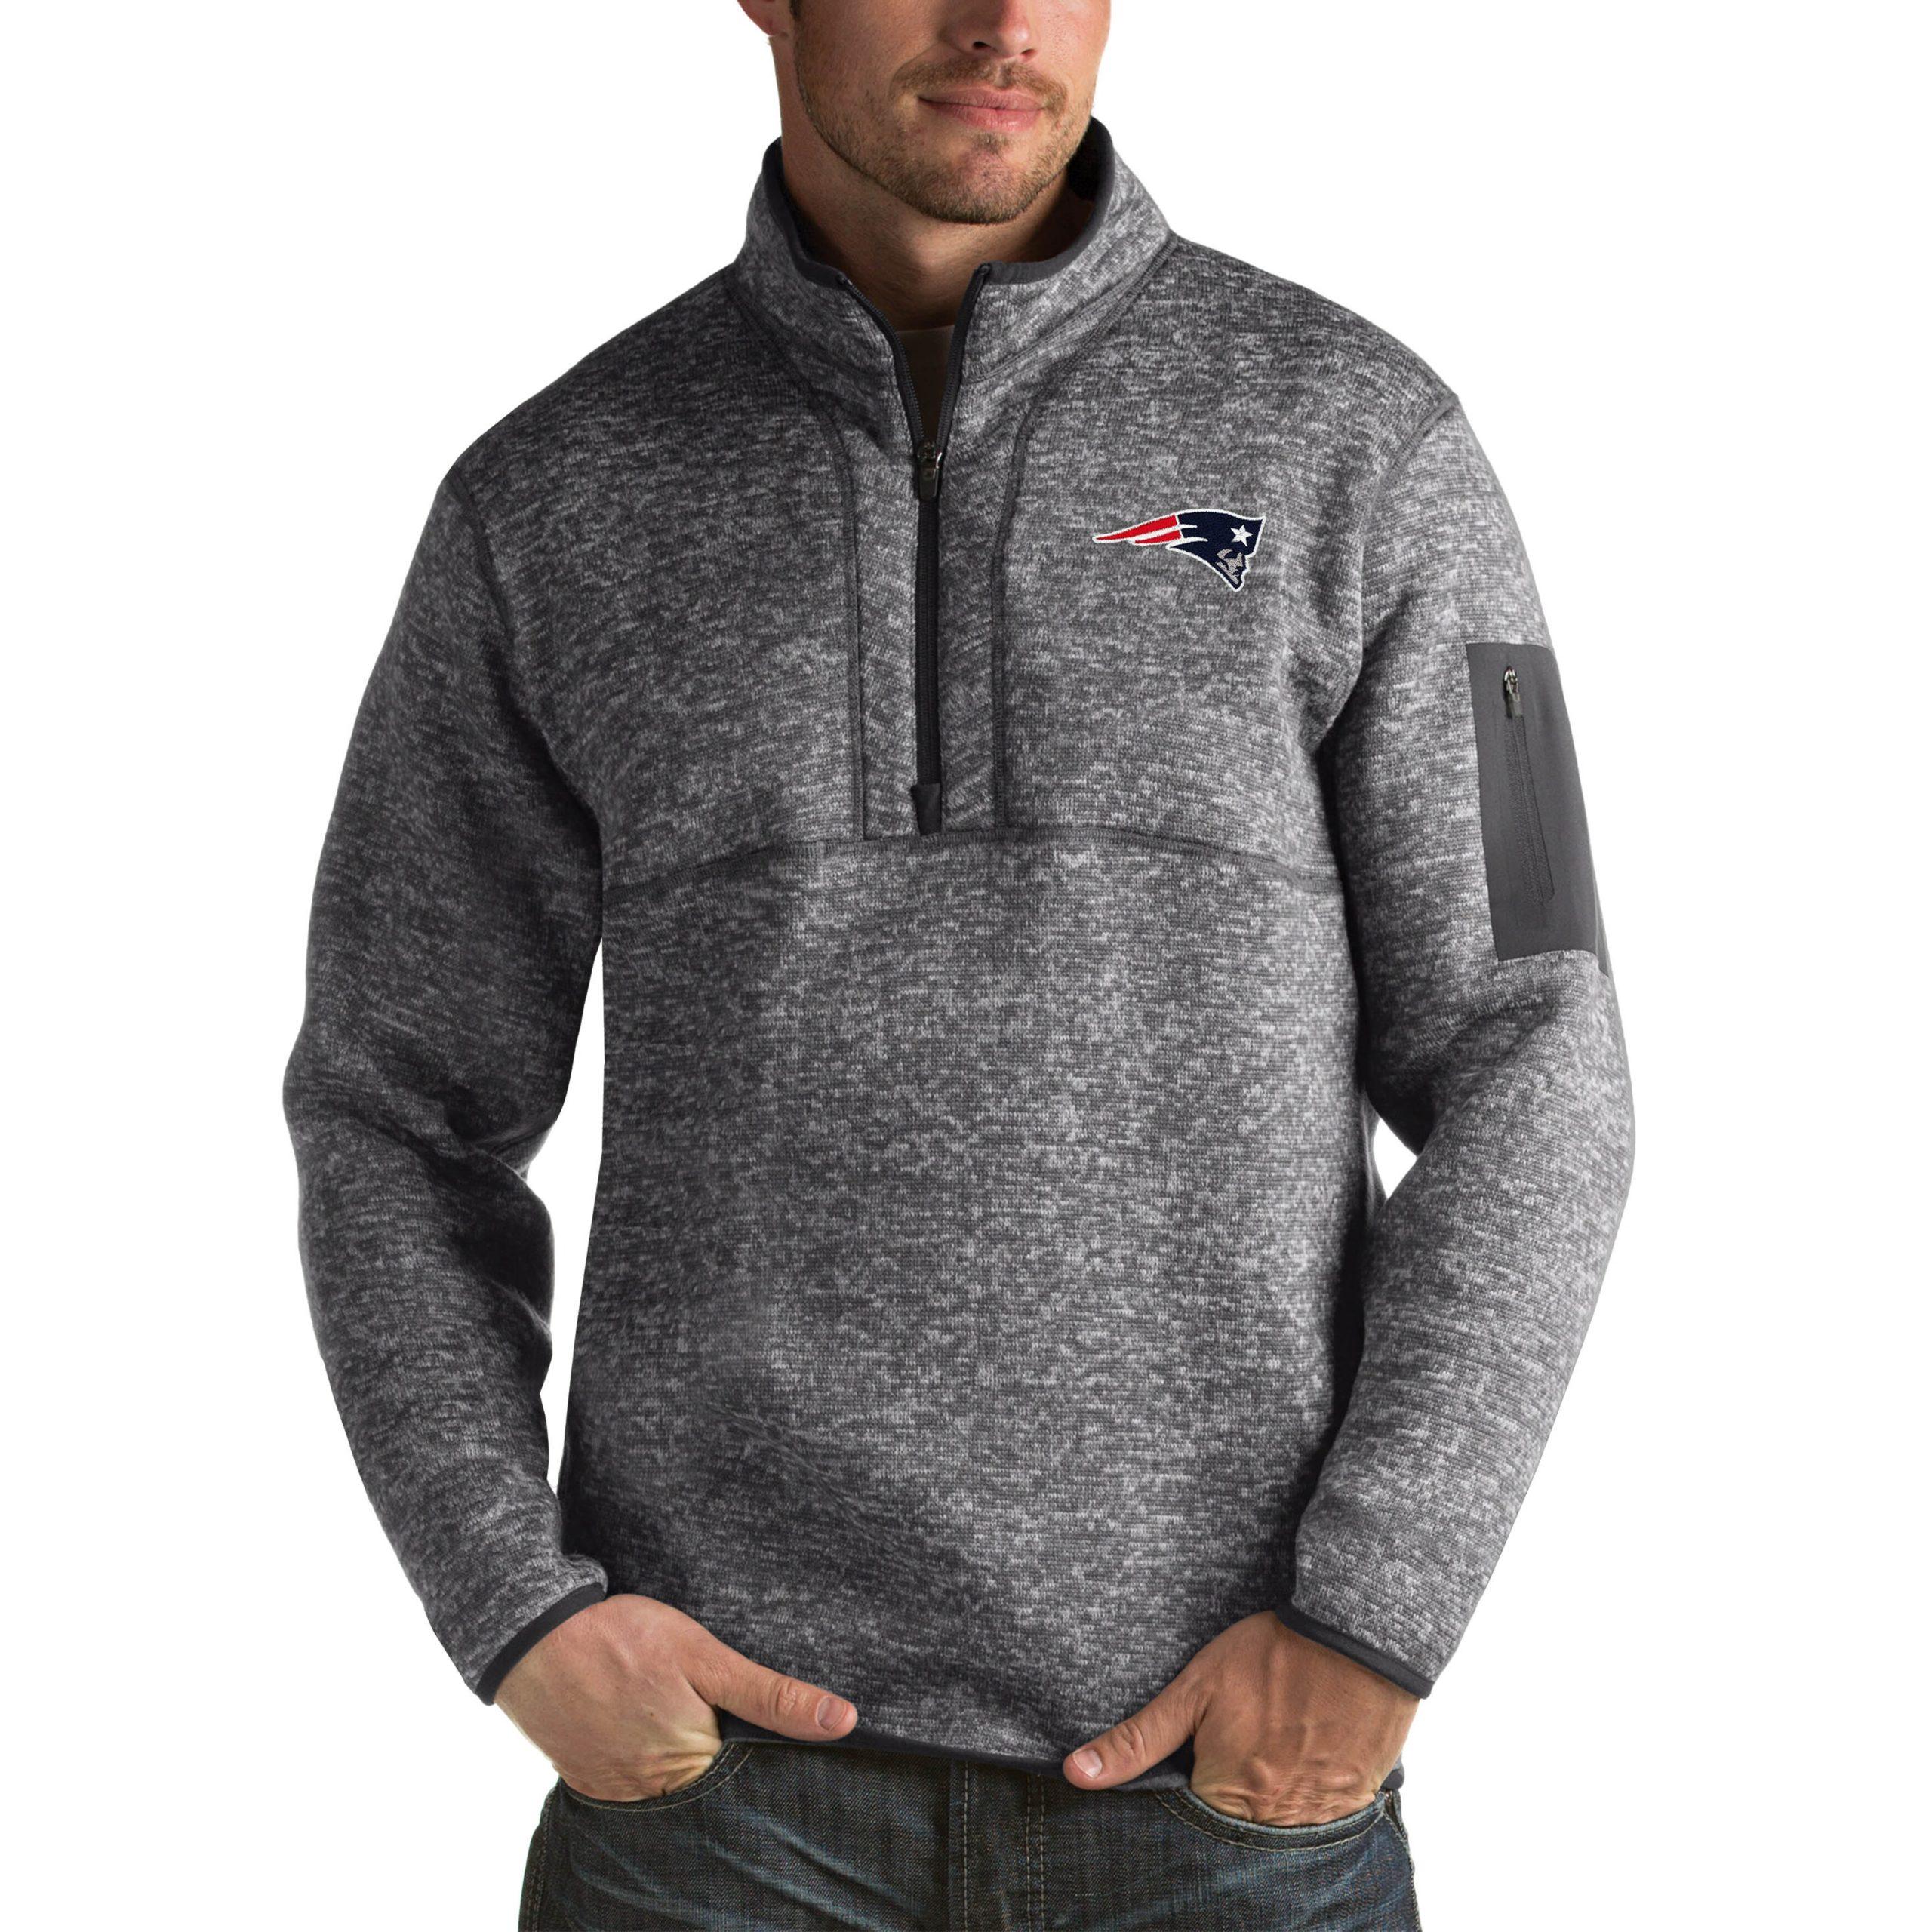 New England Patriots Antigua Fortune Big & Tall Quarter-Zip Pullover Jacket - Charcoal